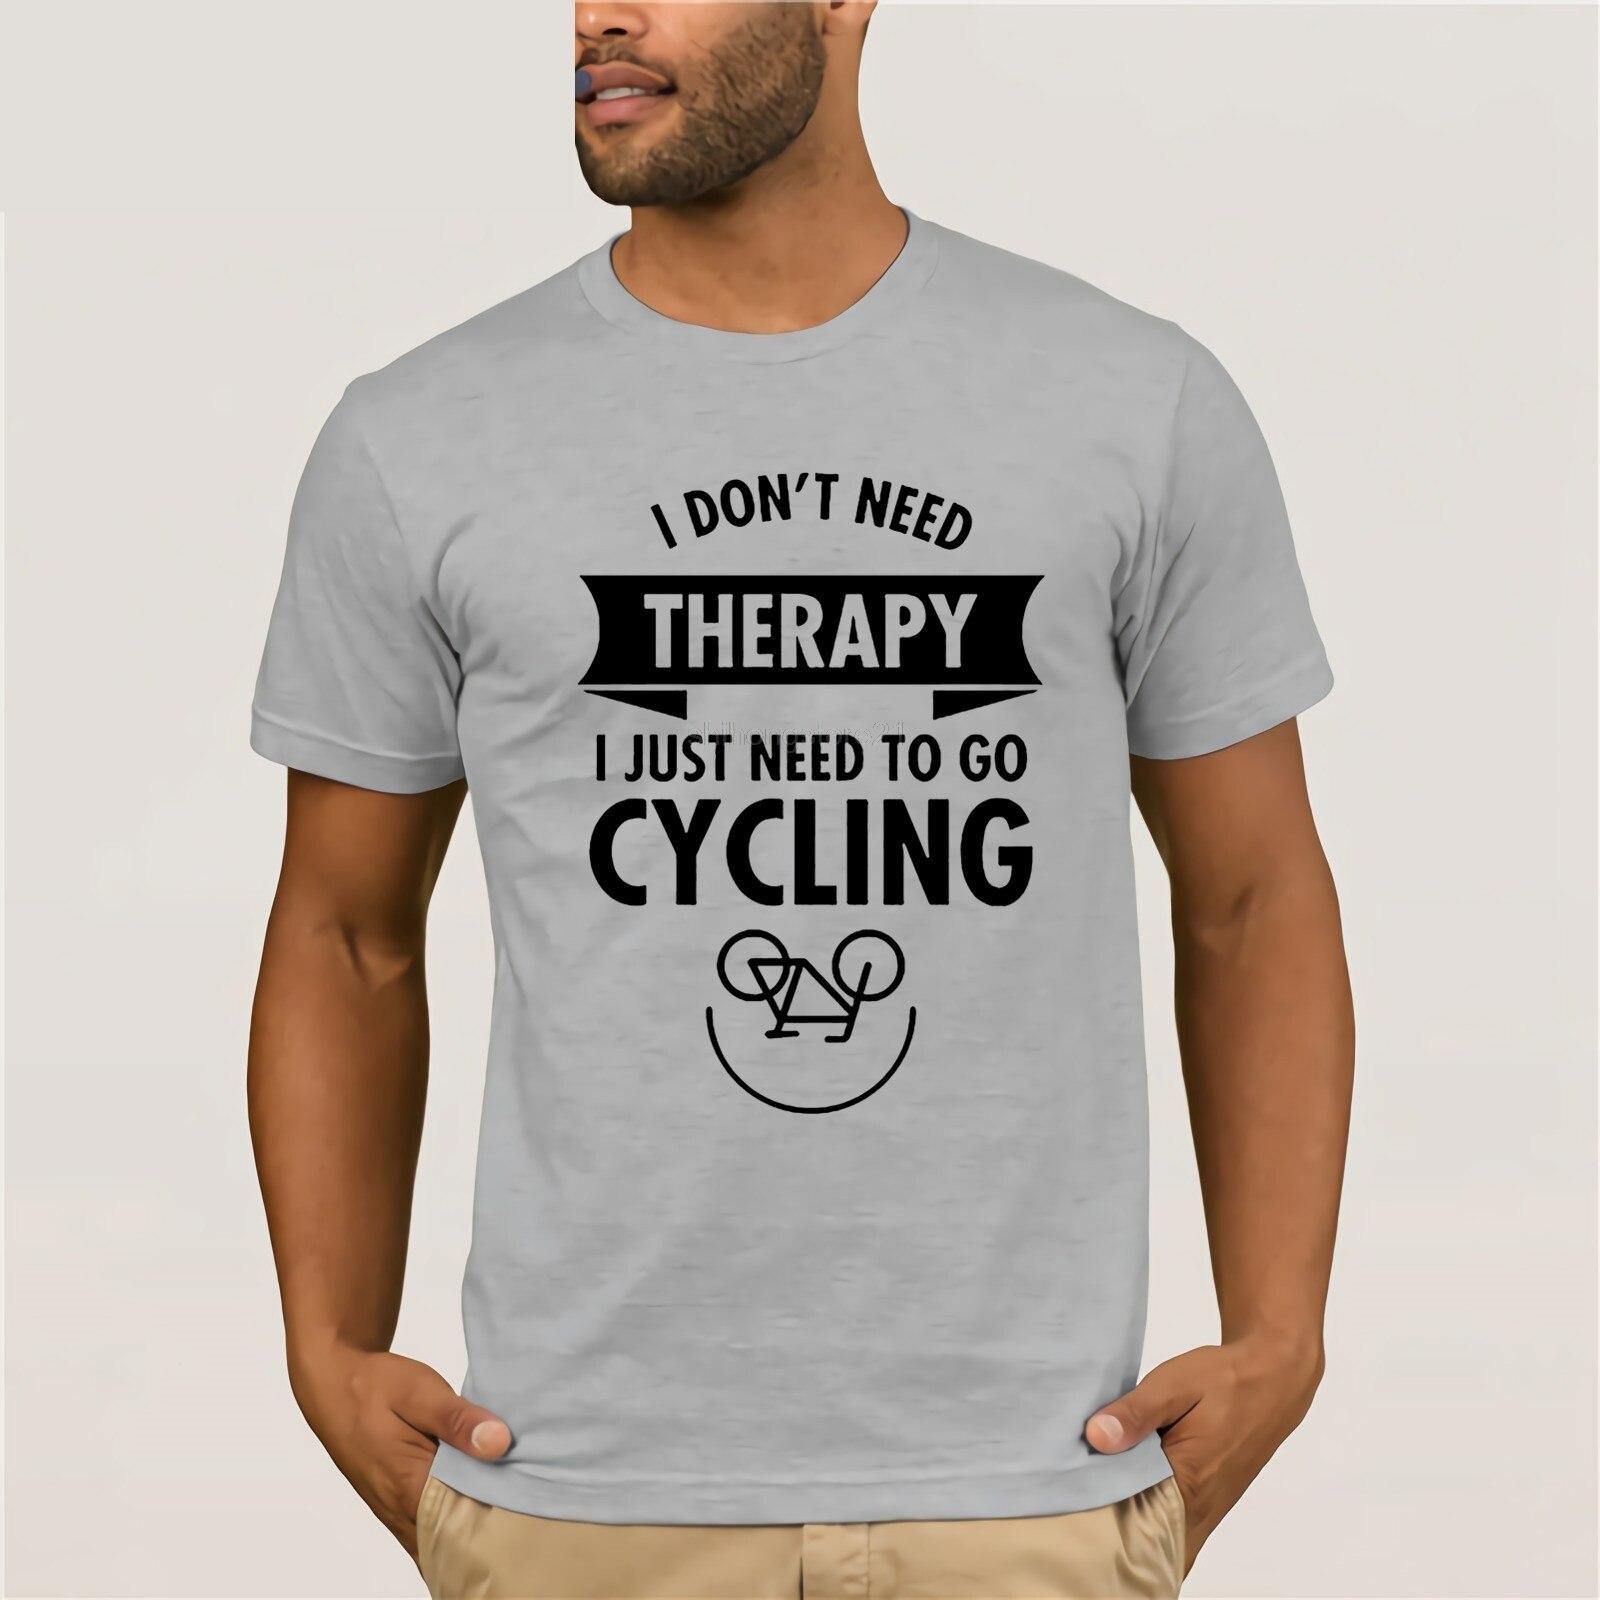 Camiseta con estampado de diseño de manga corta para hombre con estampado de diseño personalizado a medida I Dont Need Therapy I Just Need To Go bicycle